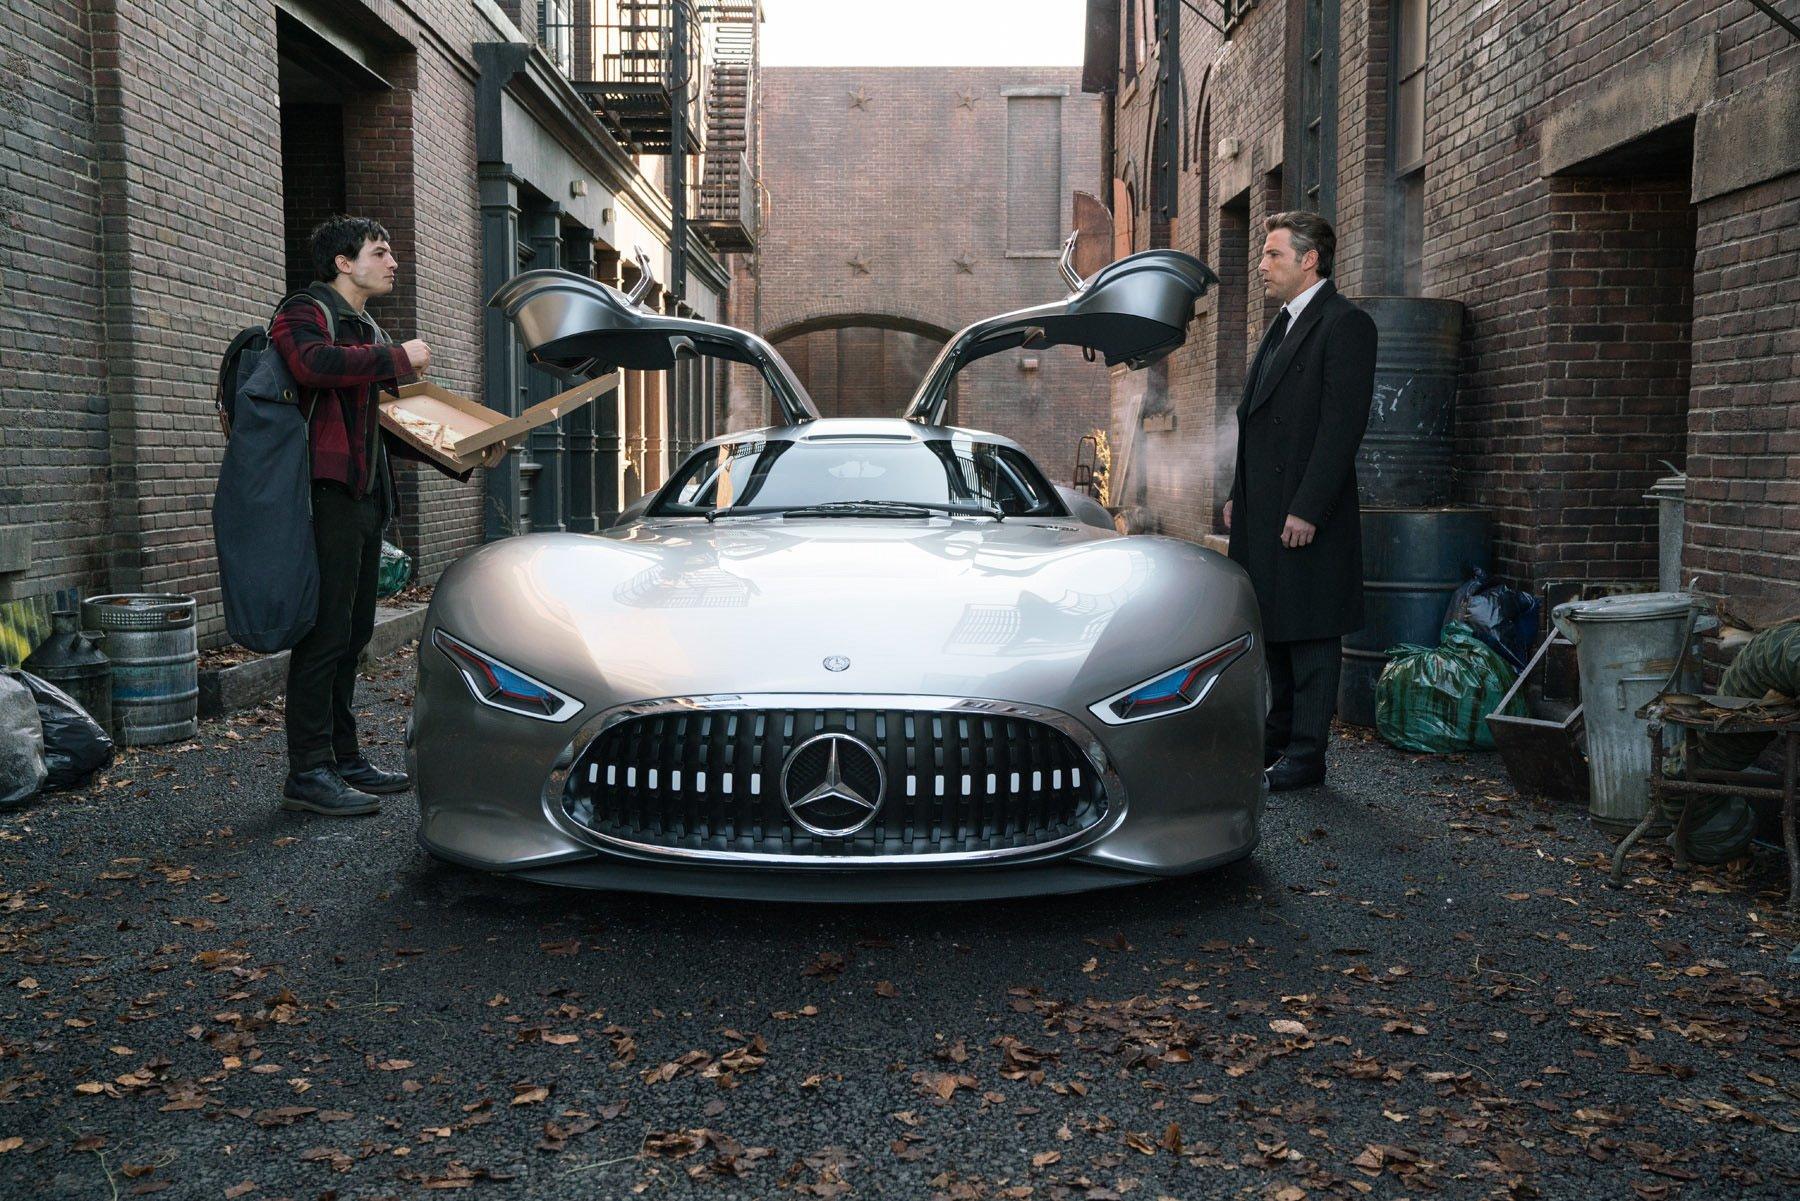 Batman Ditches Batmobile For A Civilian Merc In Justice League